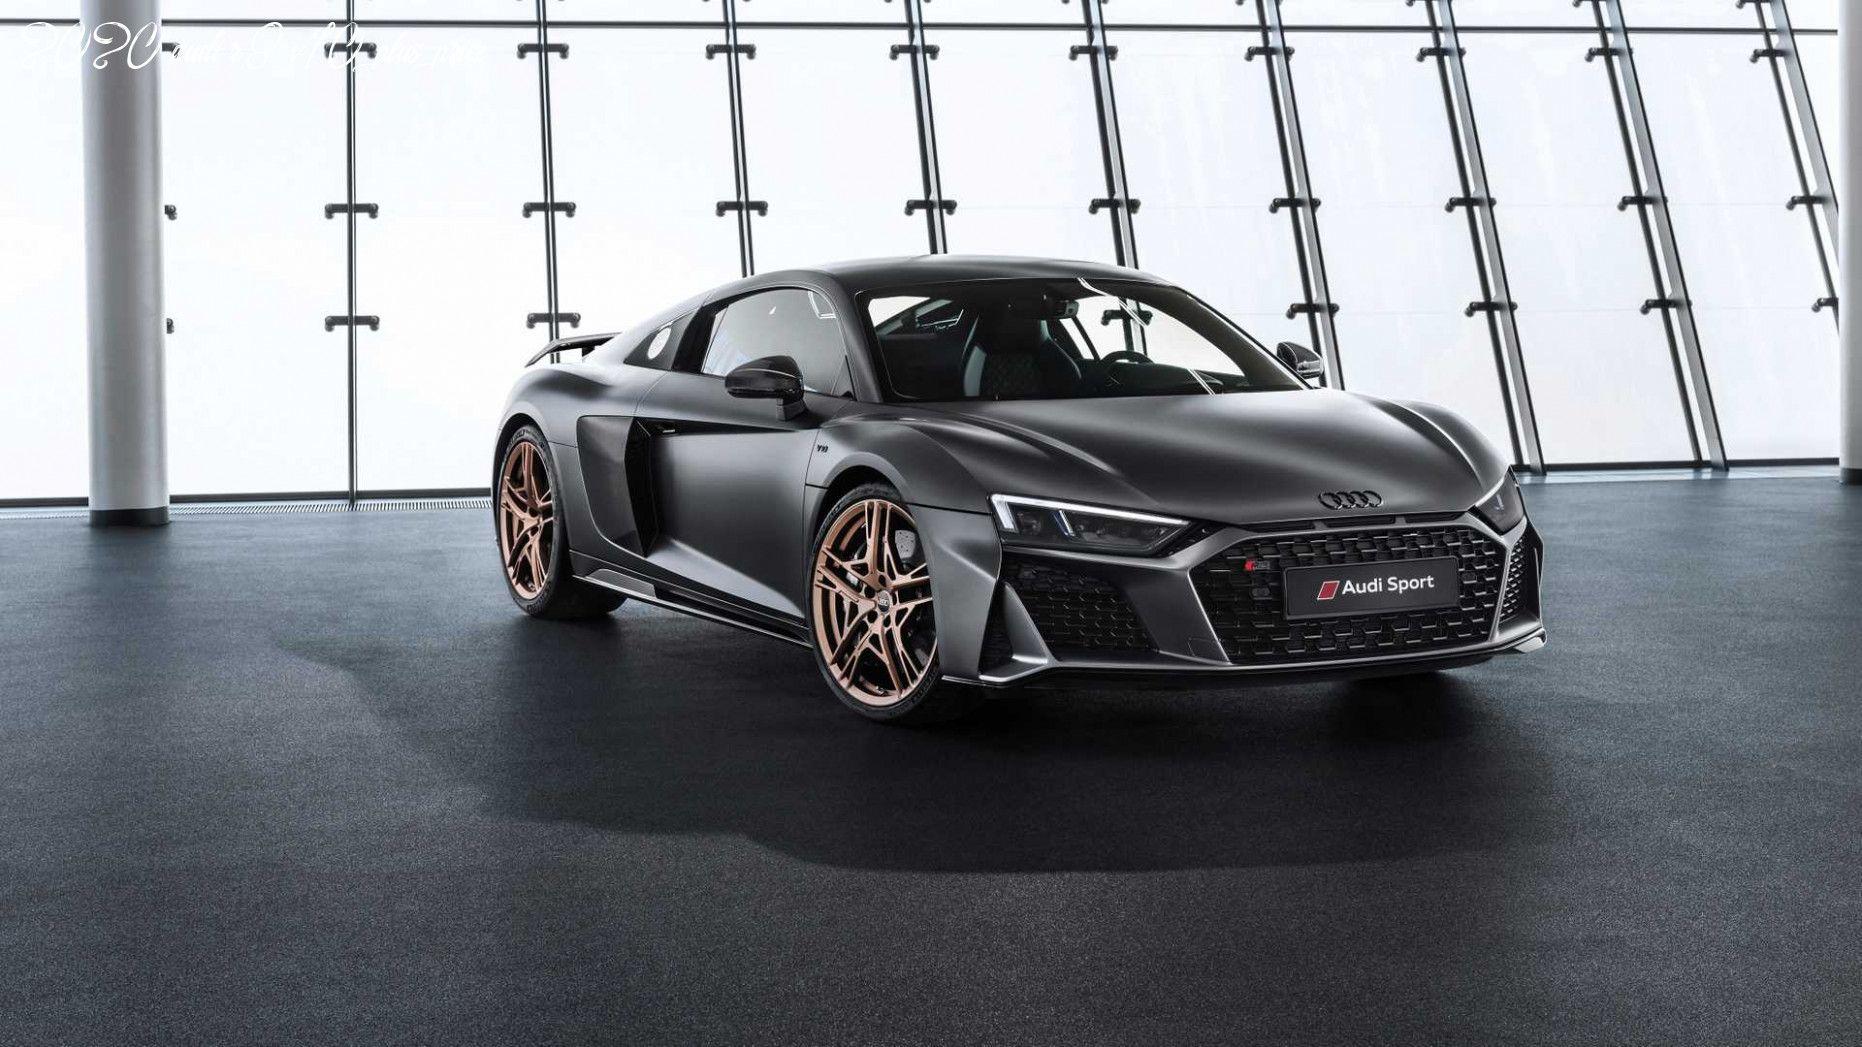 2020 Audi R8 V10 Plus Price In 2020 Audi R8 V10 Audi R8 V10 Plus Audi Sports Car